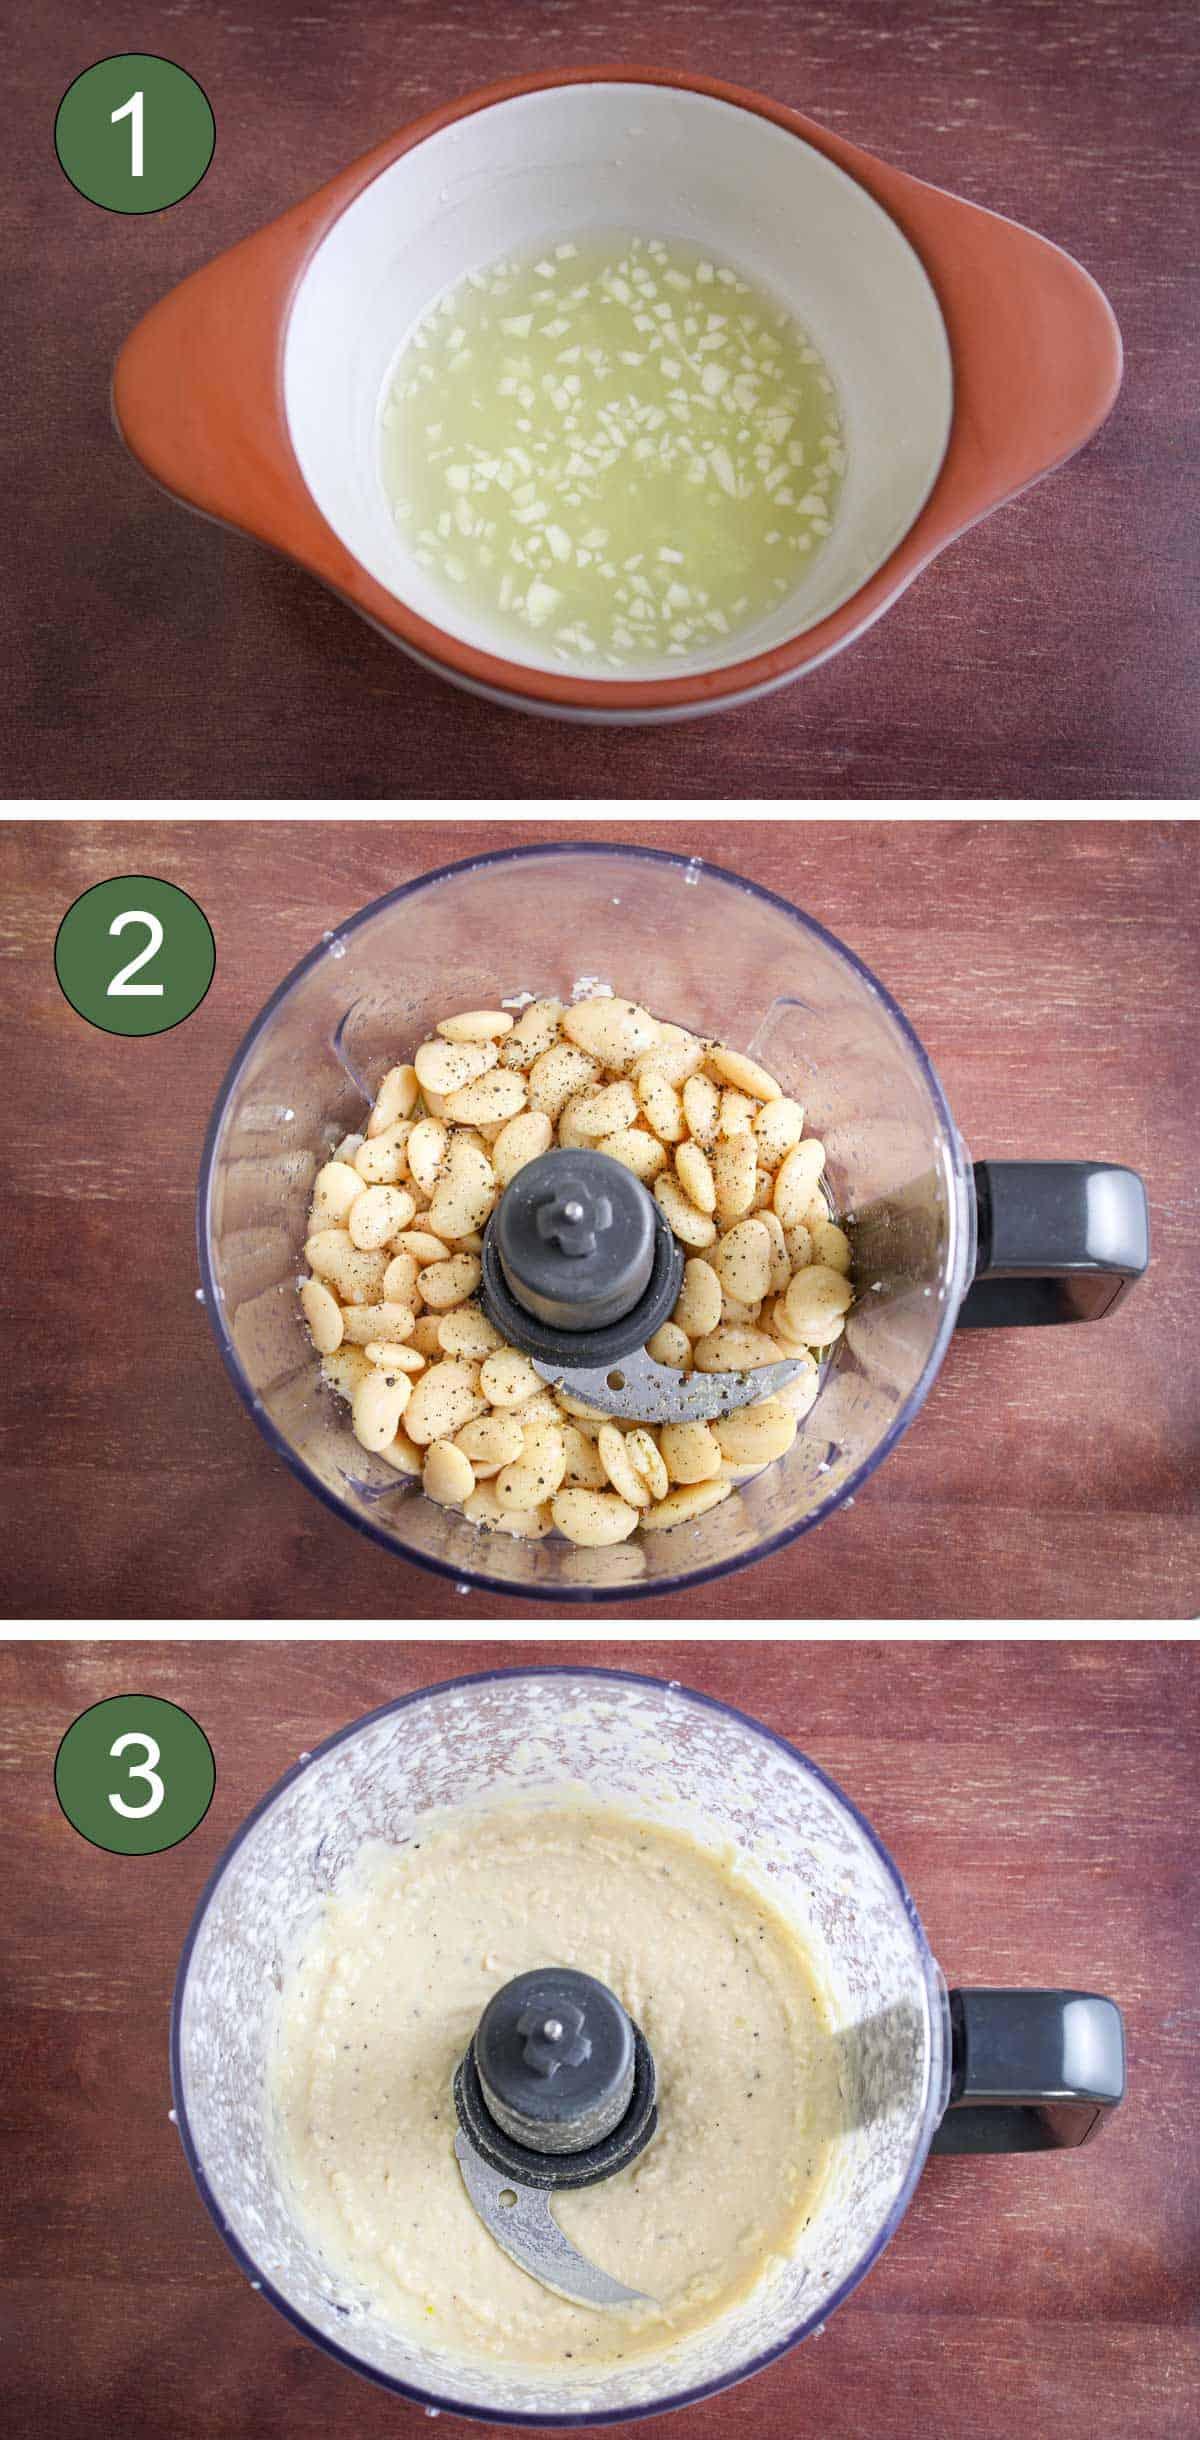 Process Shots of How to Make Lima Bean Dip